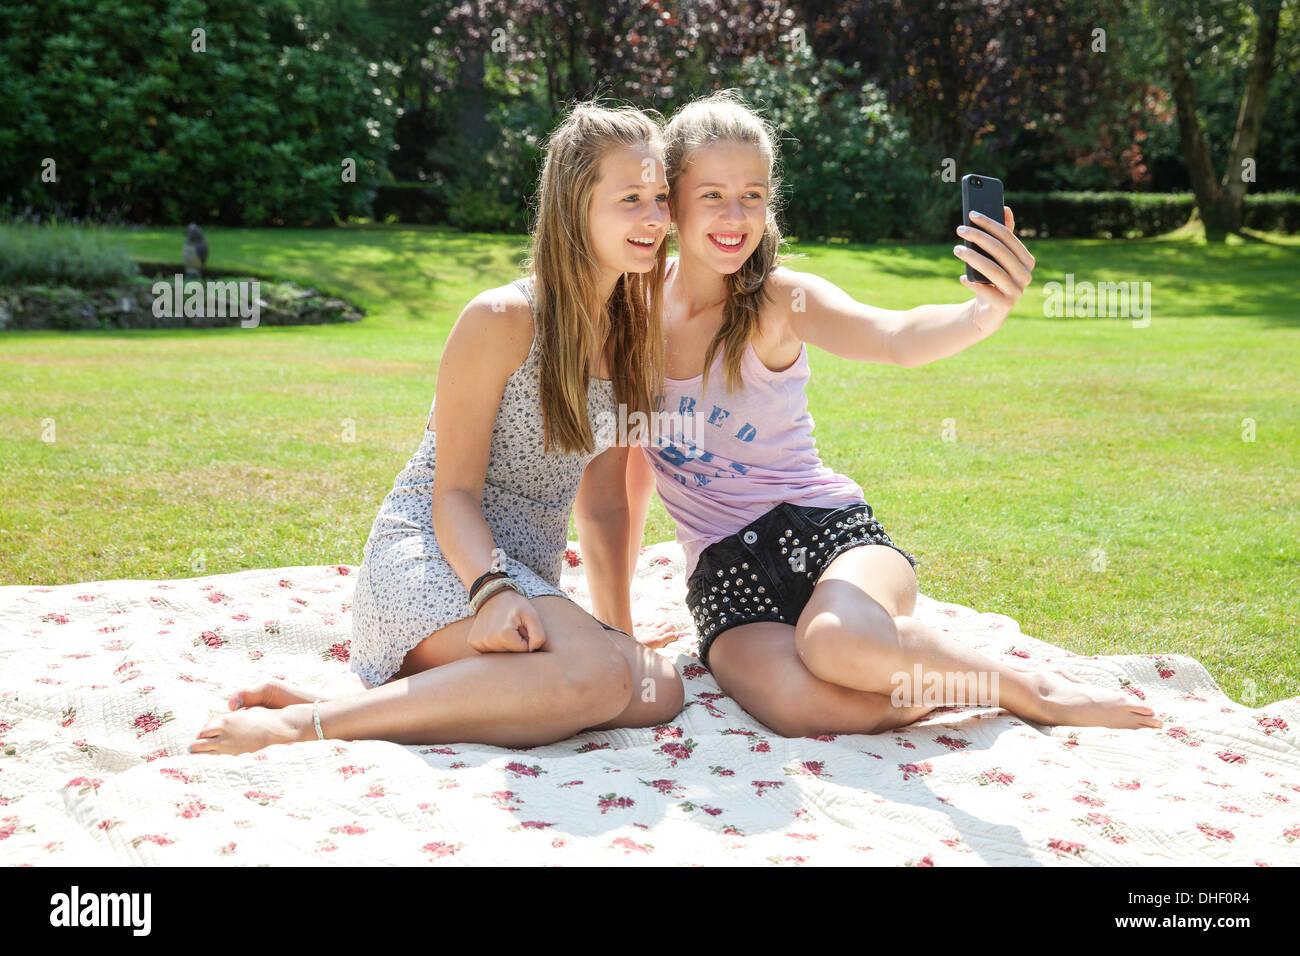 Two teenage girls on picnic blanket taking self portrait - Stock Image